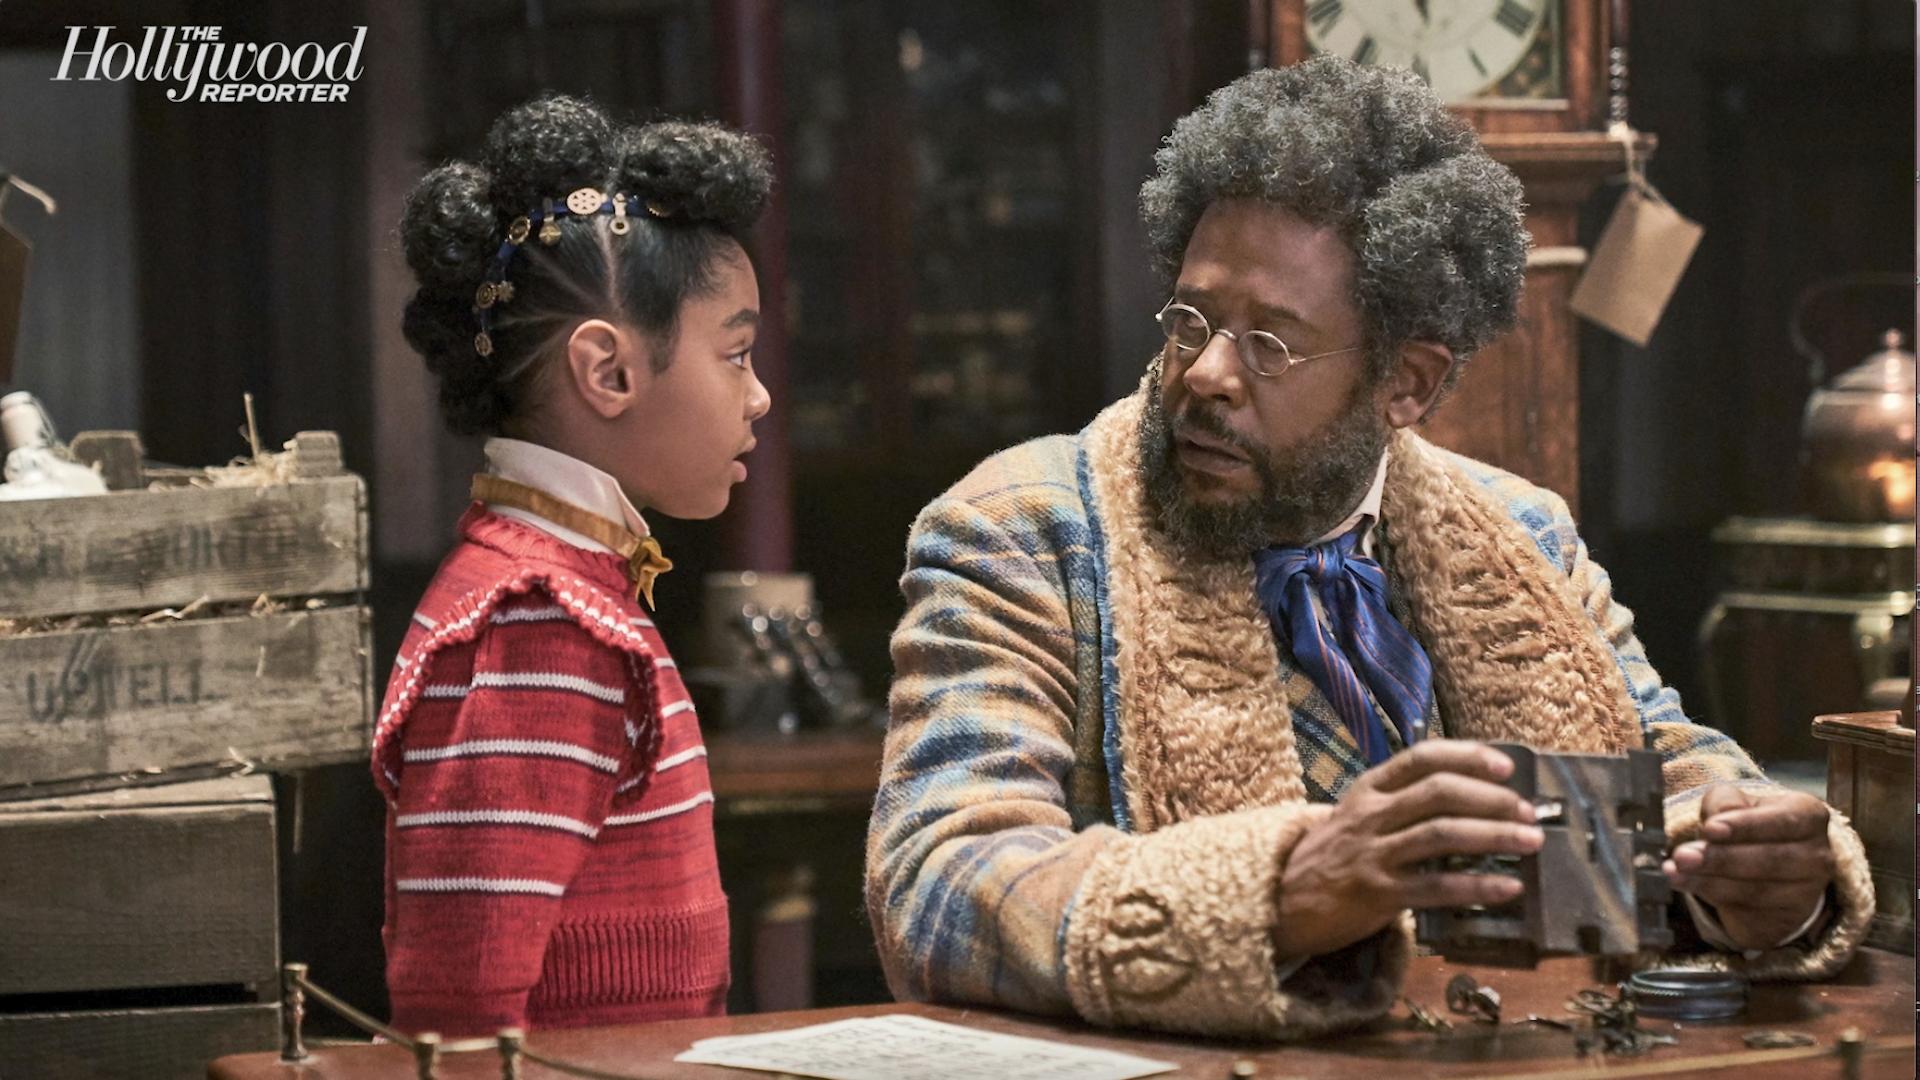 NAACP Image Awards: 'Black-ish,' 'Jingle Jangle,' 'Ma Rainey's Black Bottom' Top Nominations